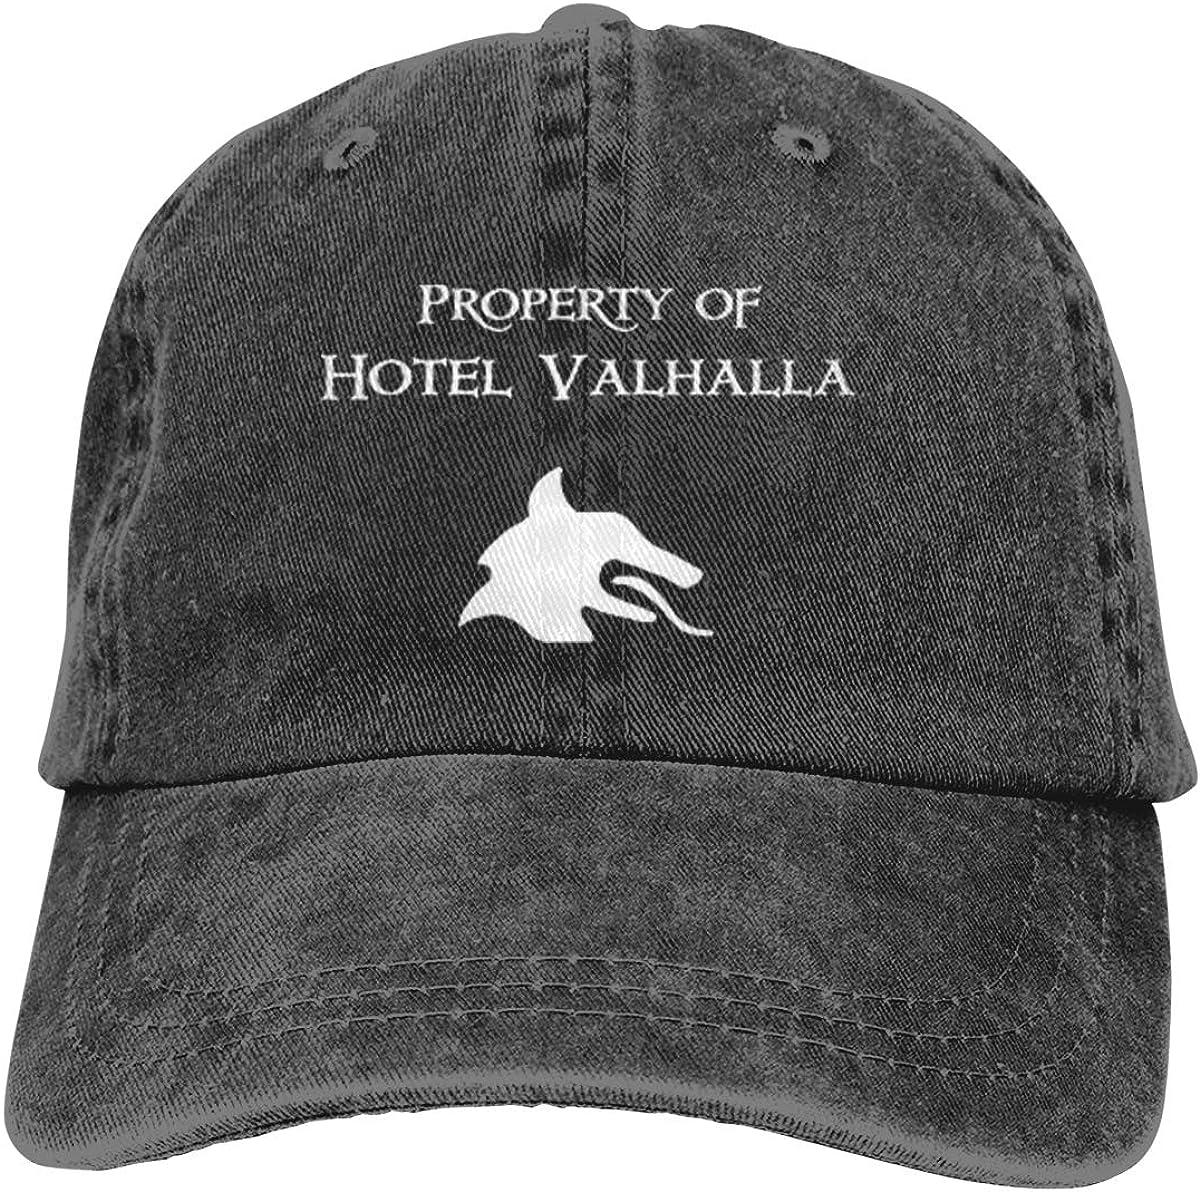 QDGERWGY Property of Hotel Valhalla Trucks Cotton Hat Cowboy Hat Baseball Caps